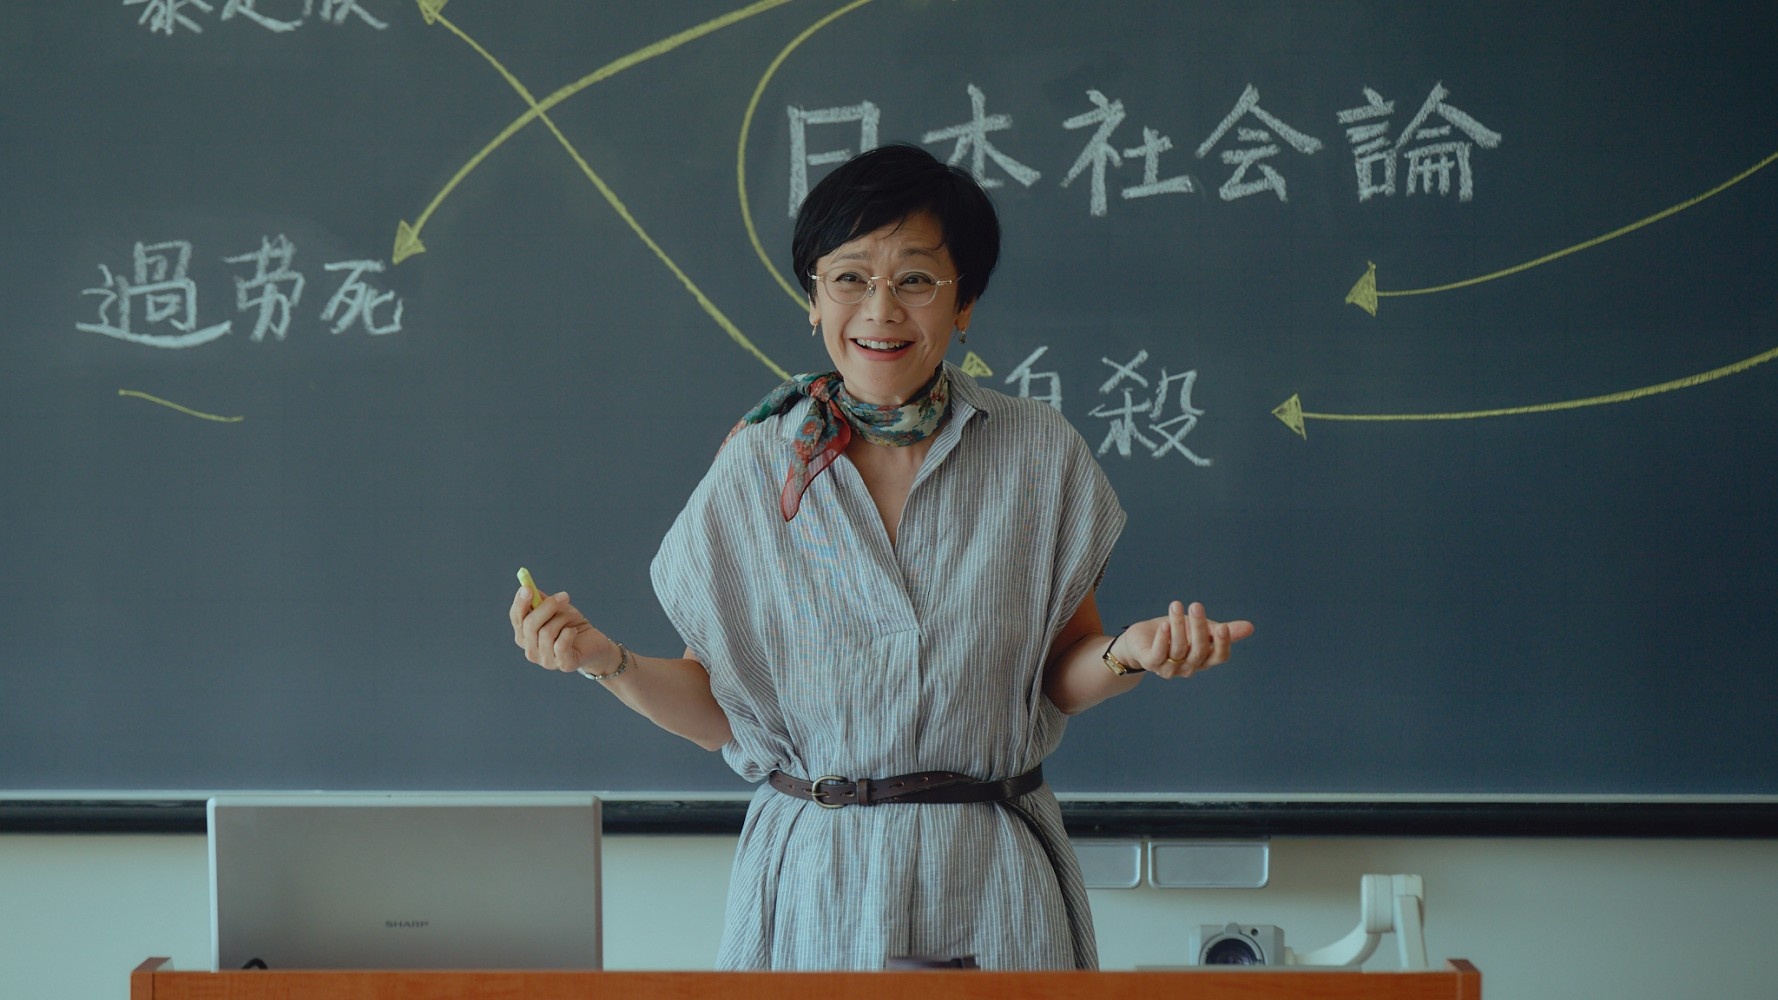 Before Next Spring recensione film di Li Gen con Qi Xi e Niu Chao